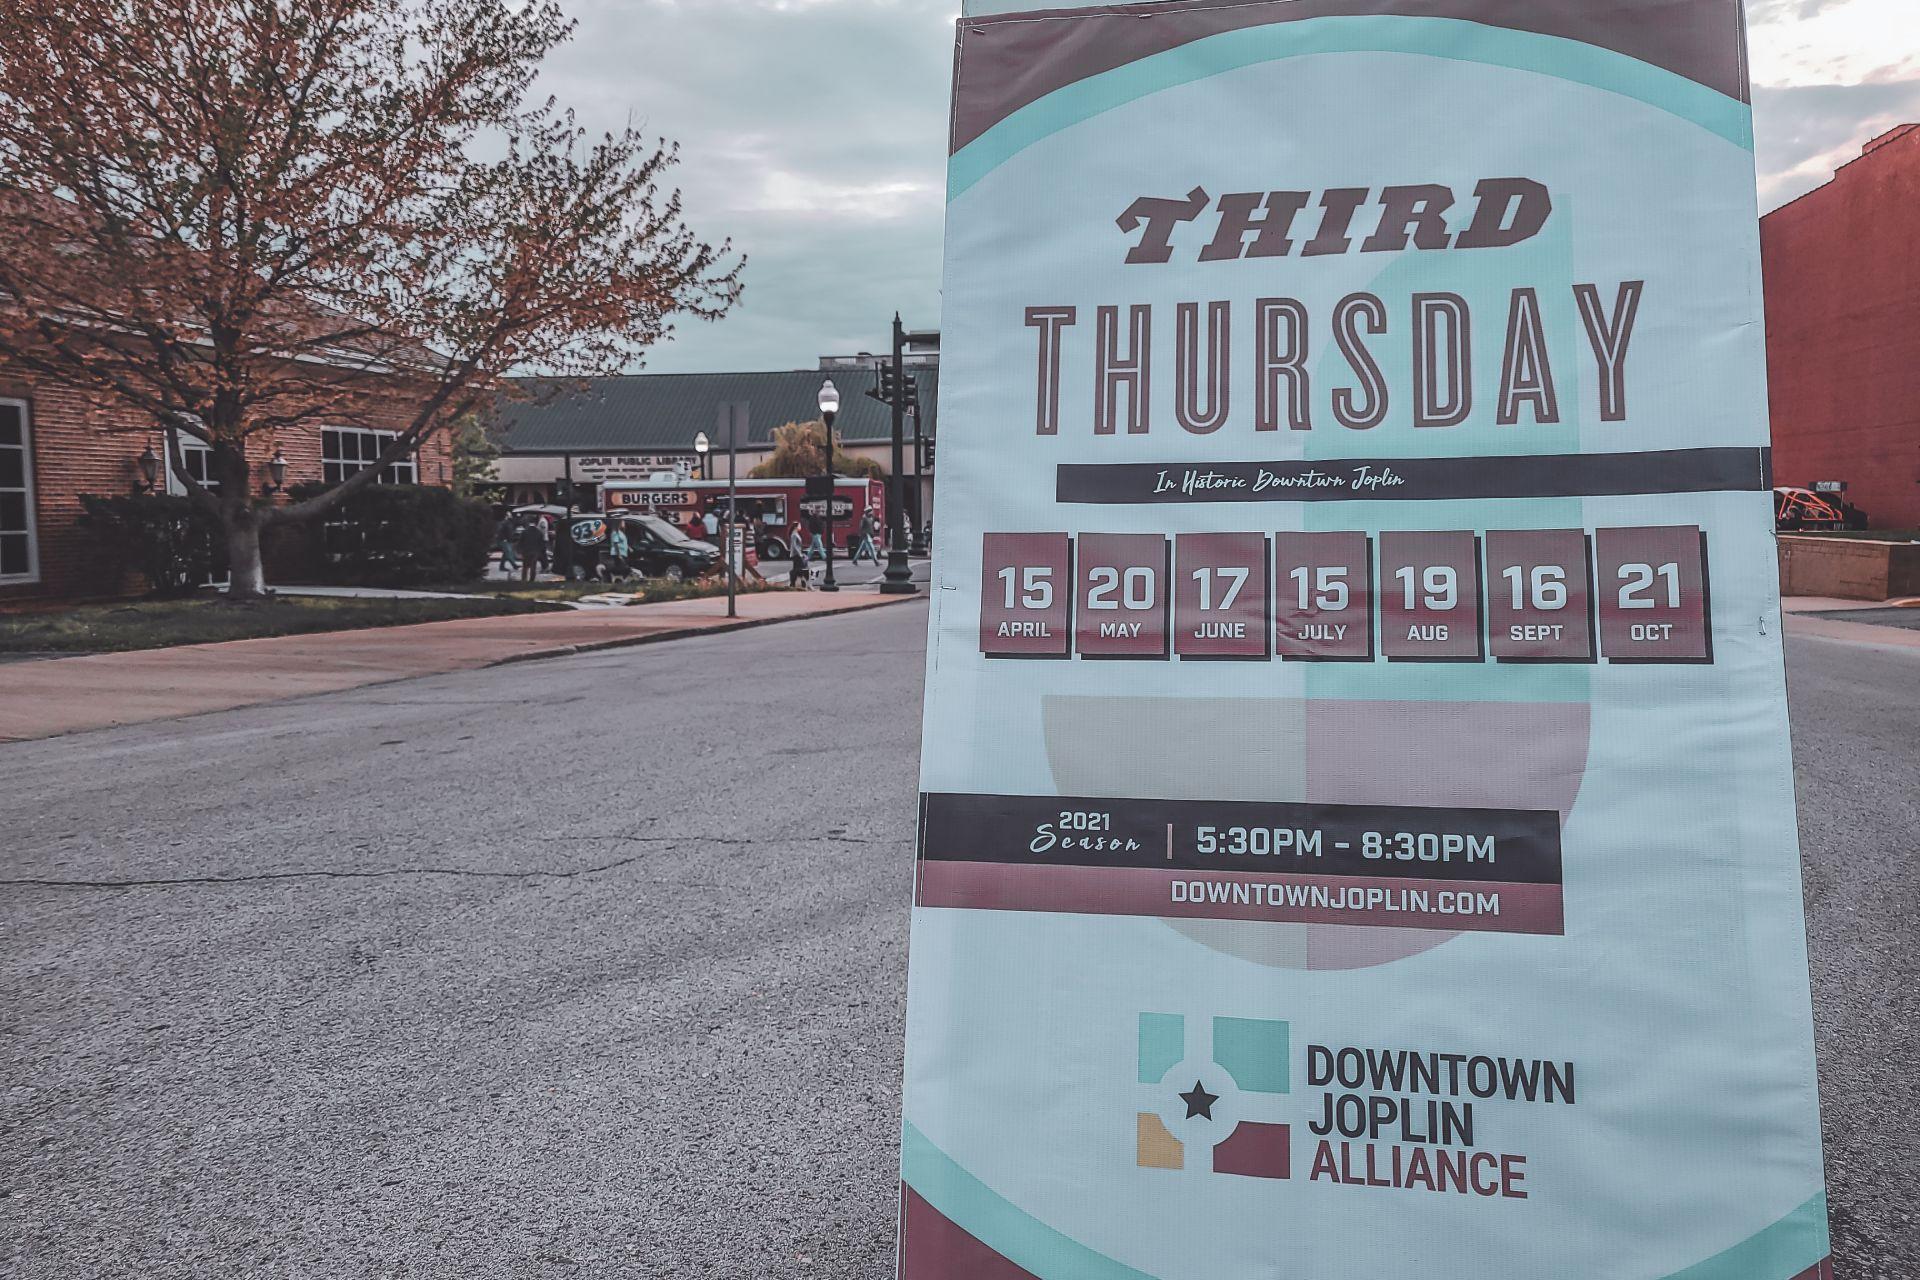 Third Thursday comes back to Joplin. 1